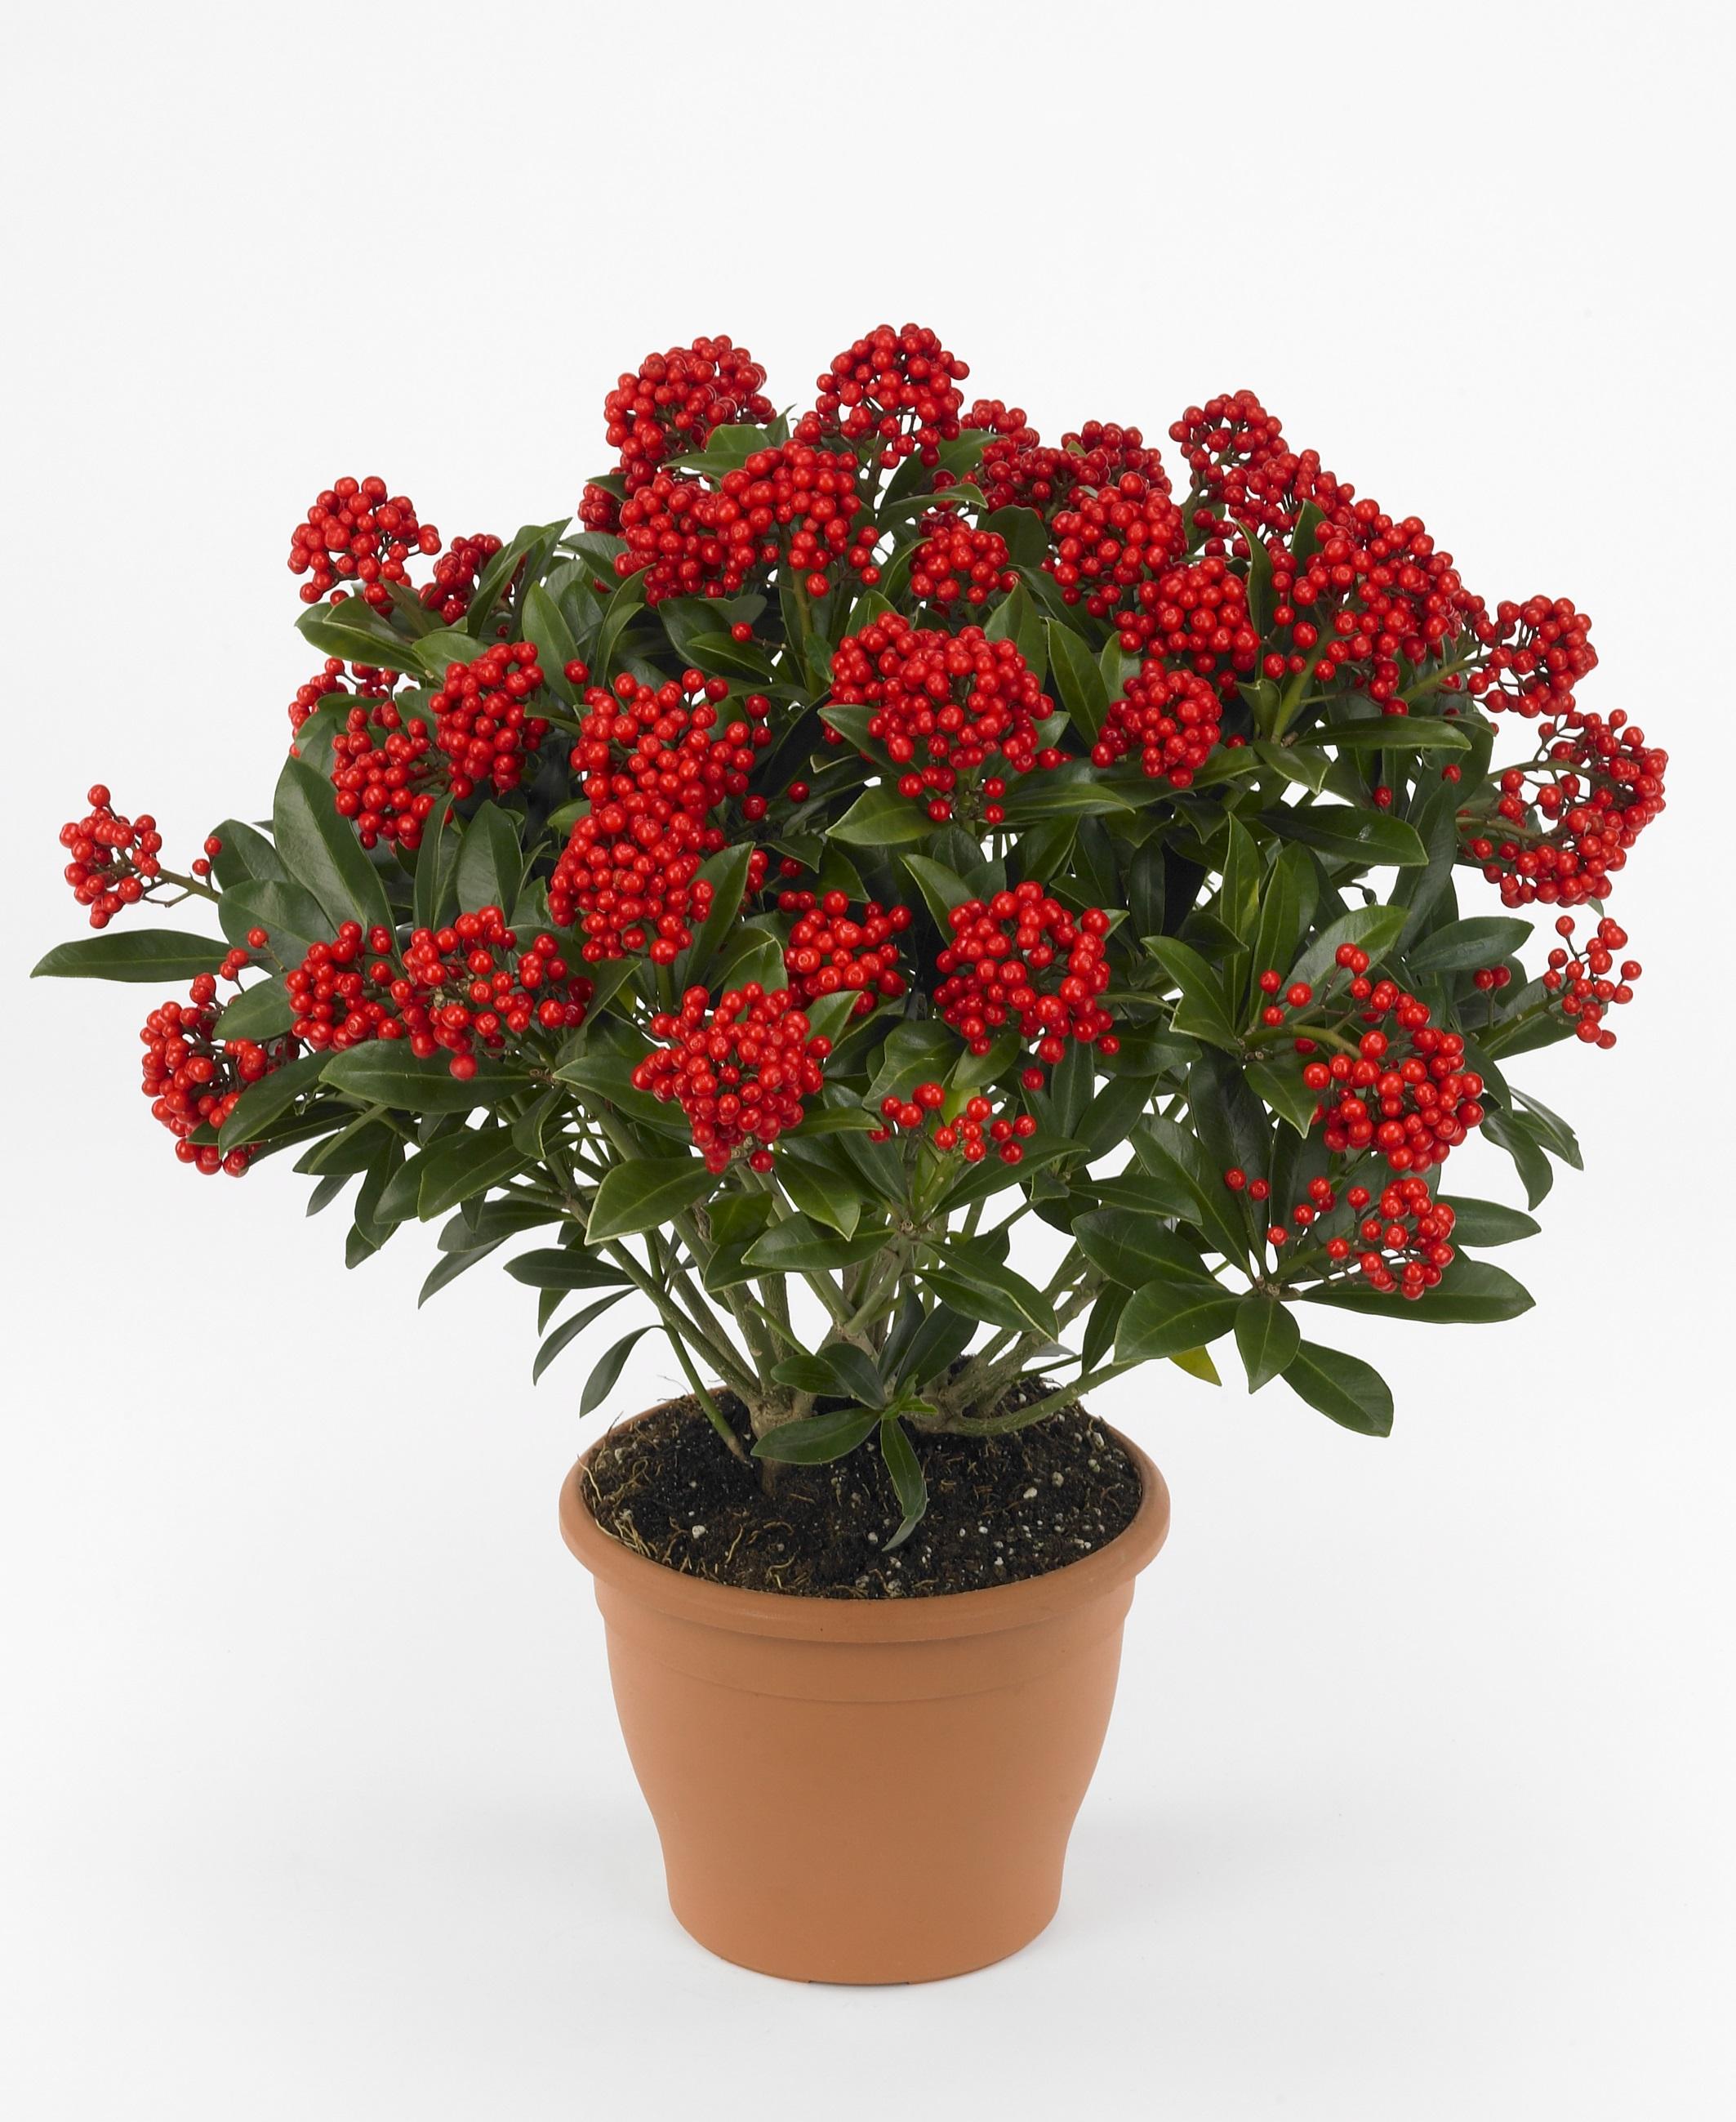 skimmia-japonica-pabella-photo-floraholland